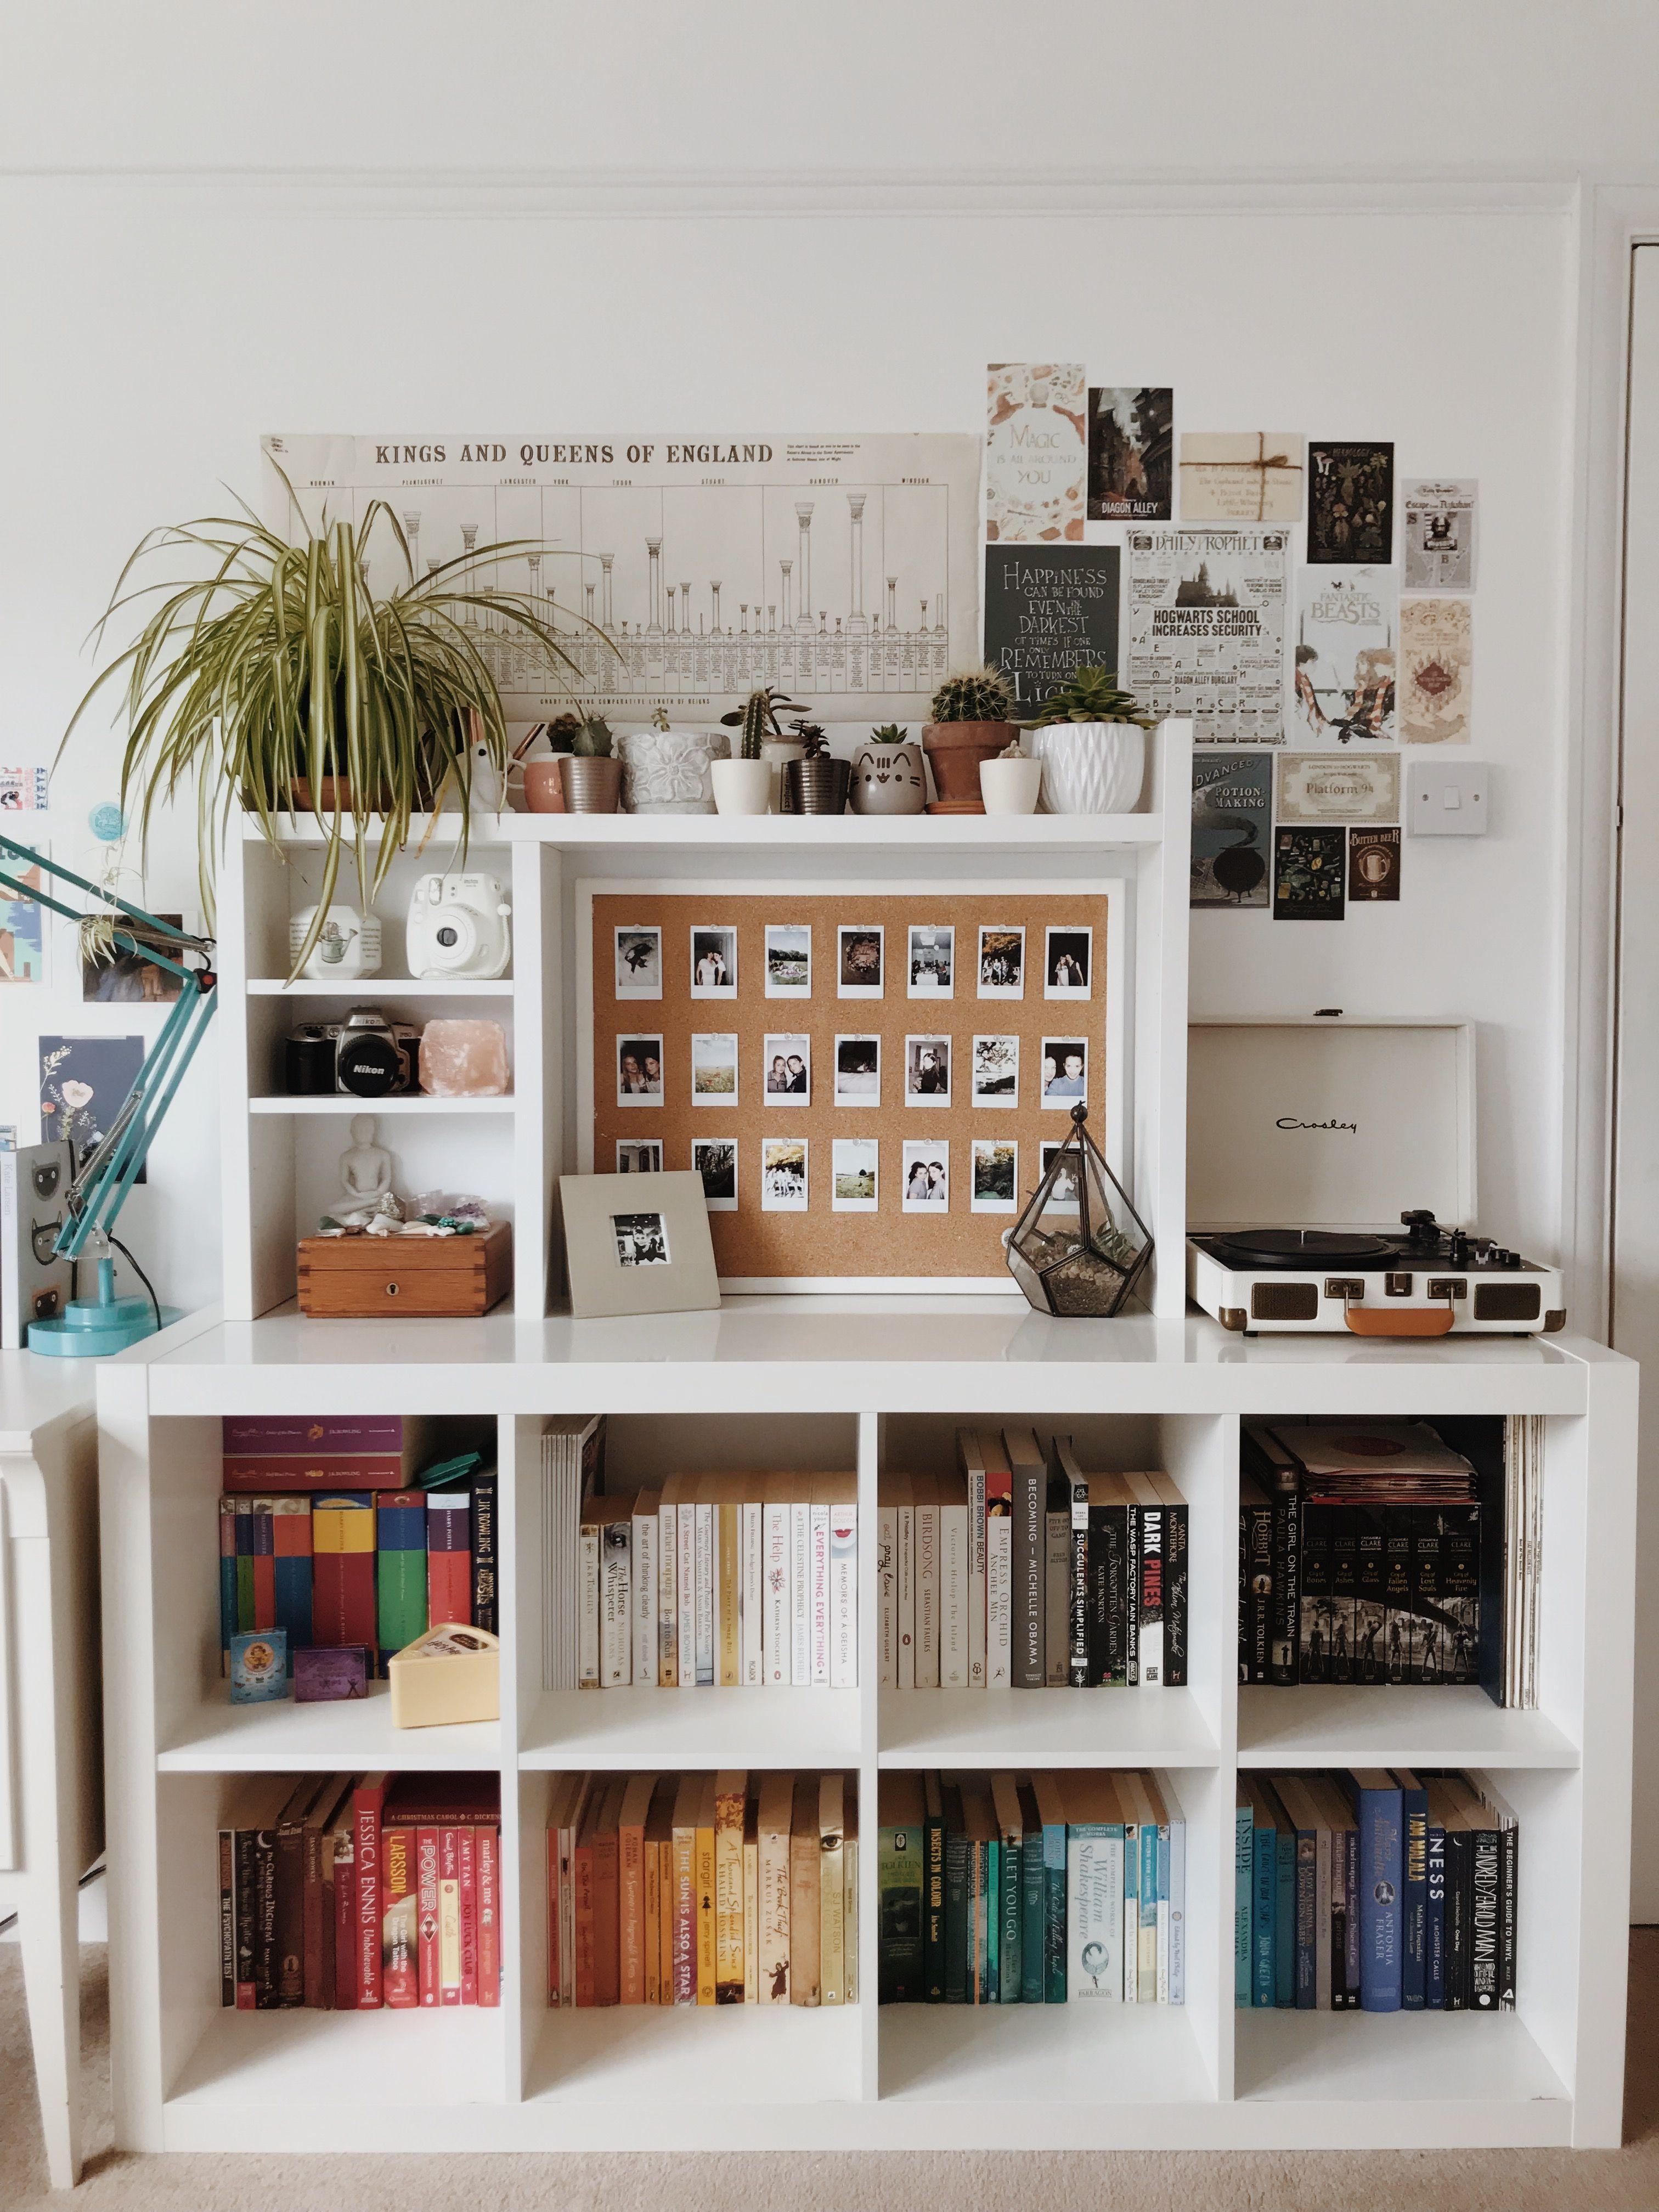 Pinterest Elusivethought Aesthetic Room Decor Dorm Room Diy Dorm Room Decor